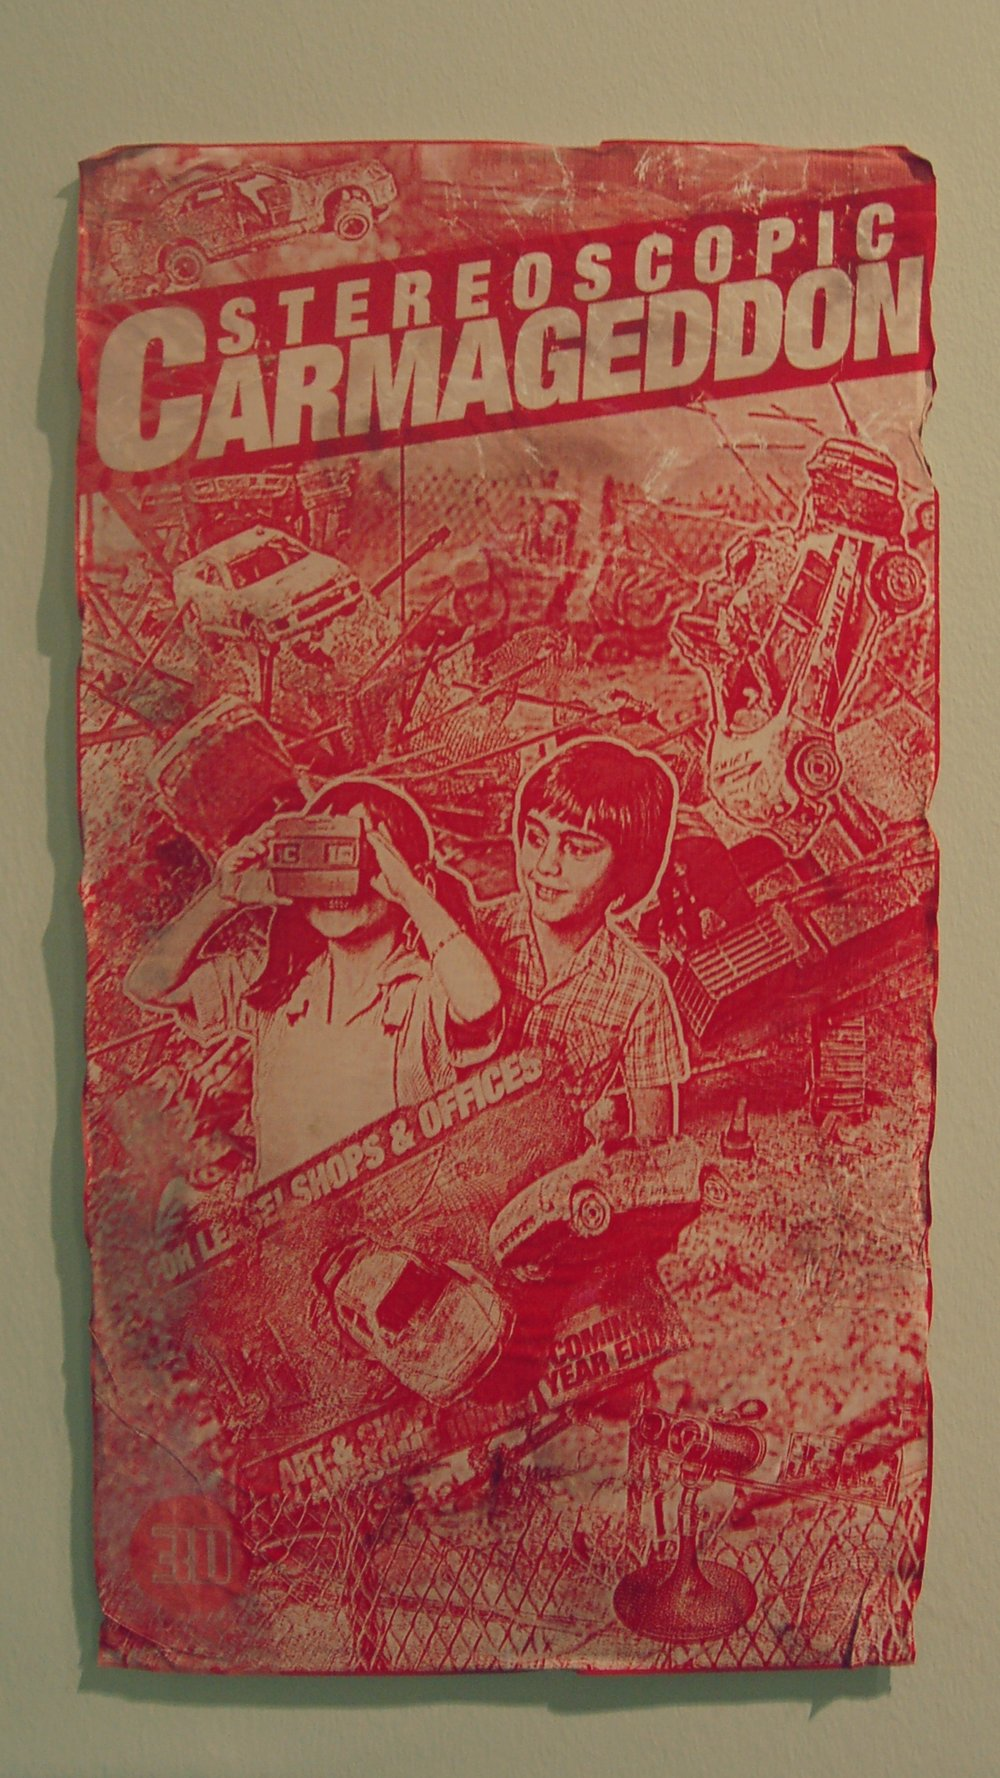 Carmageddon 3.JPG.jpg